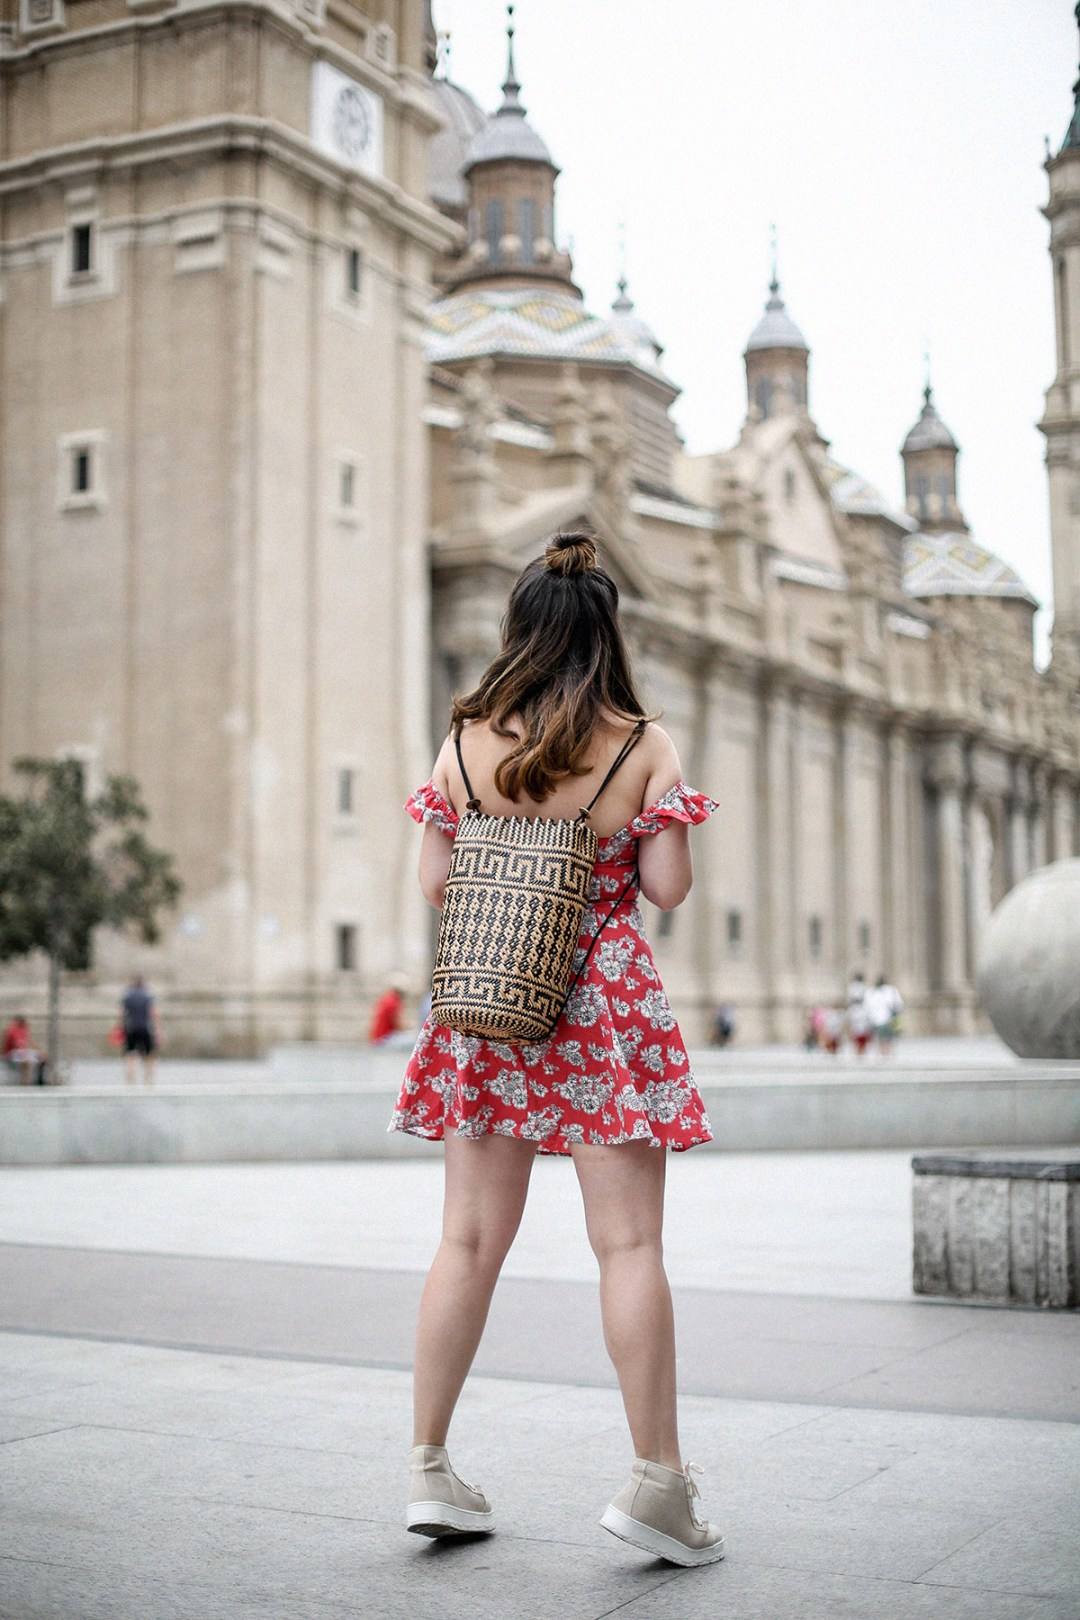 vestido-hombros-al-aire-asos-mochila-ratan-zaragoza-travel7